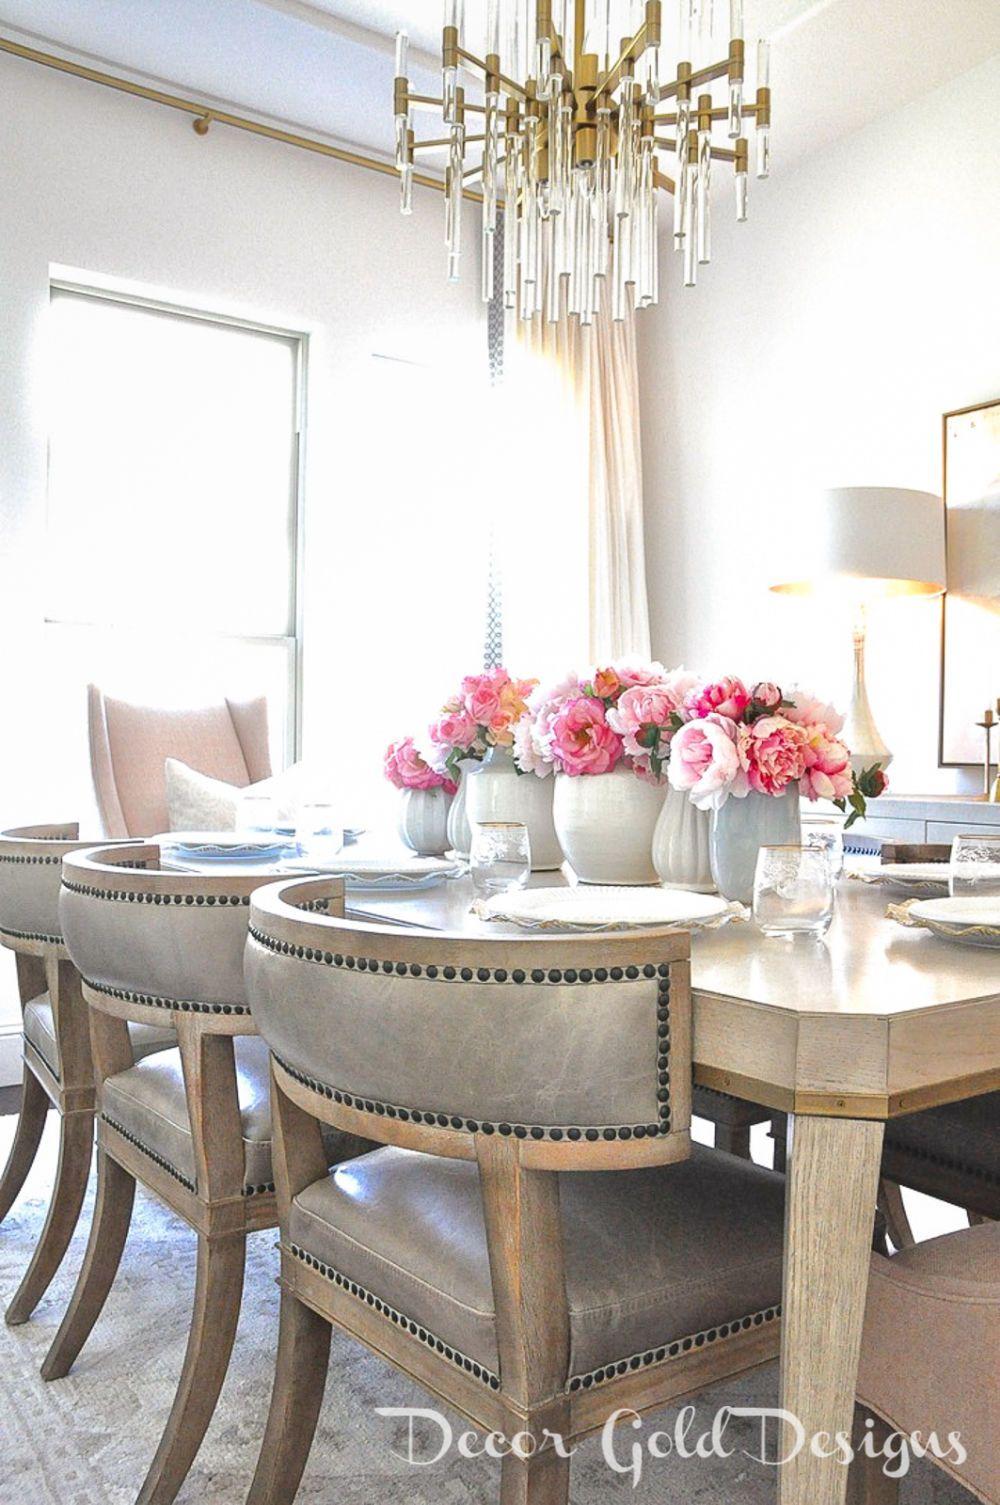 Spring Home Tour Create A Sanctuary Decor Gold Designs Sanctuary Decor Dining Room Centerpiece Dining Room Decor